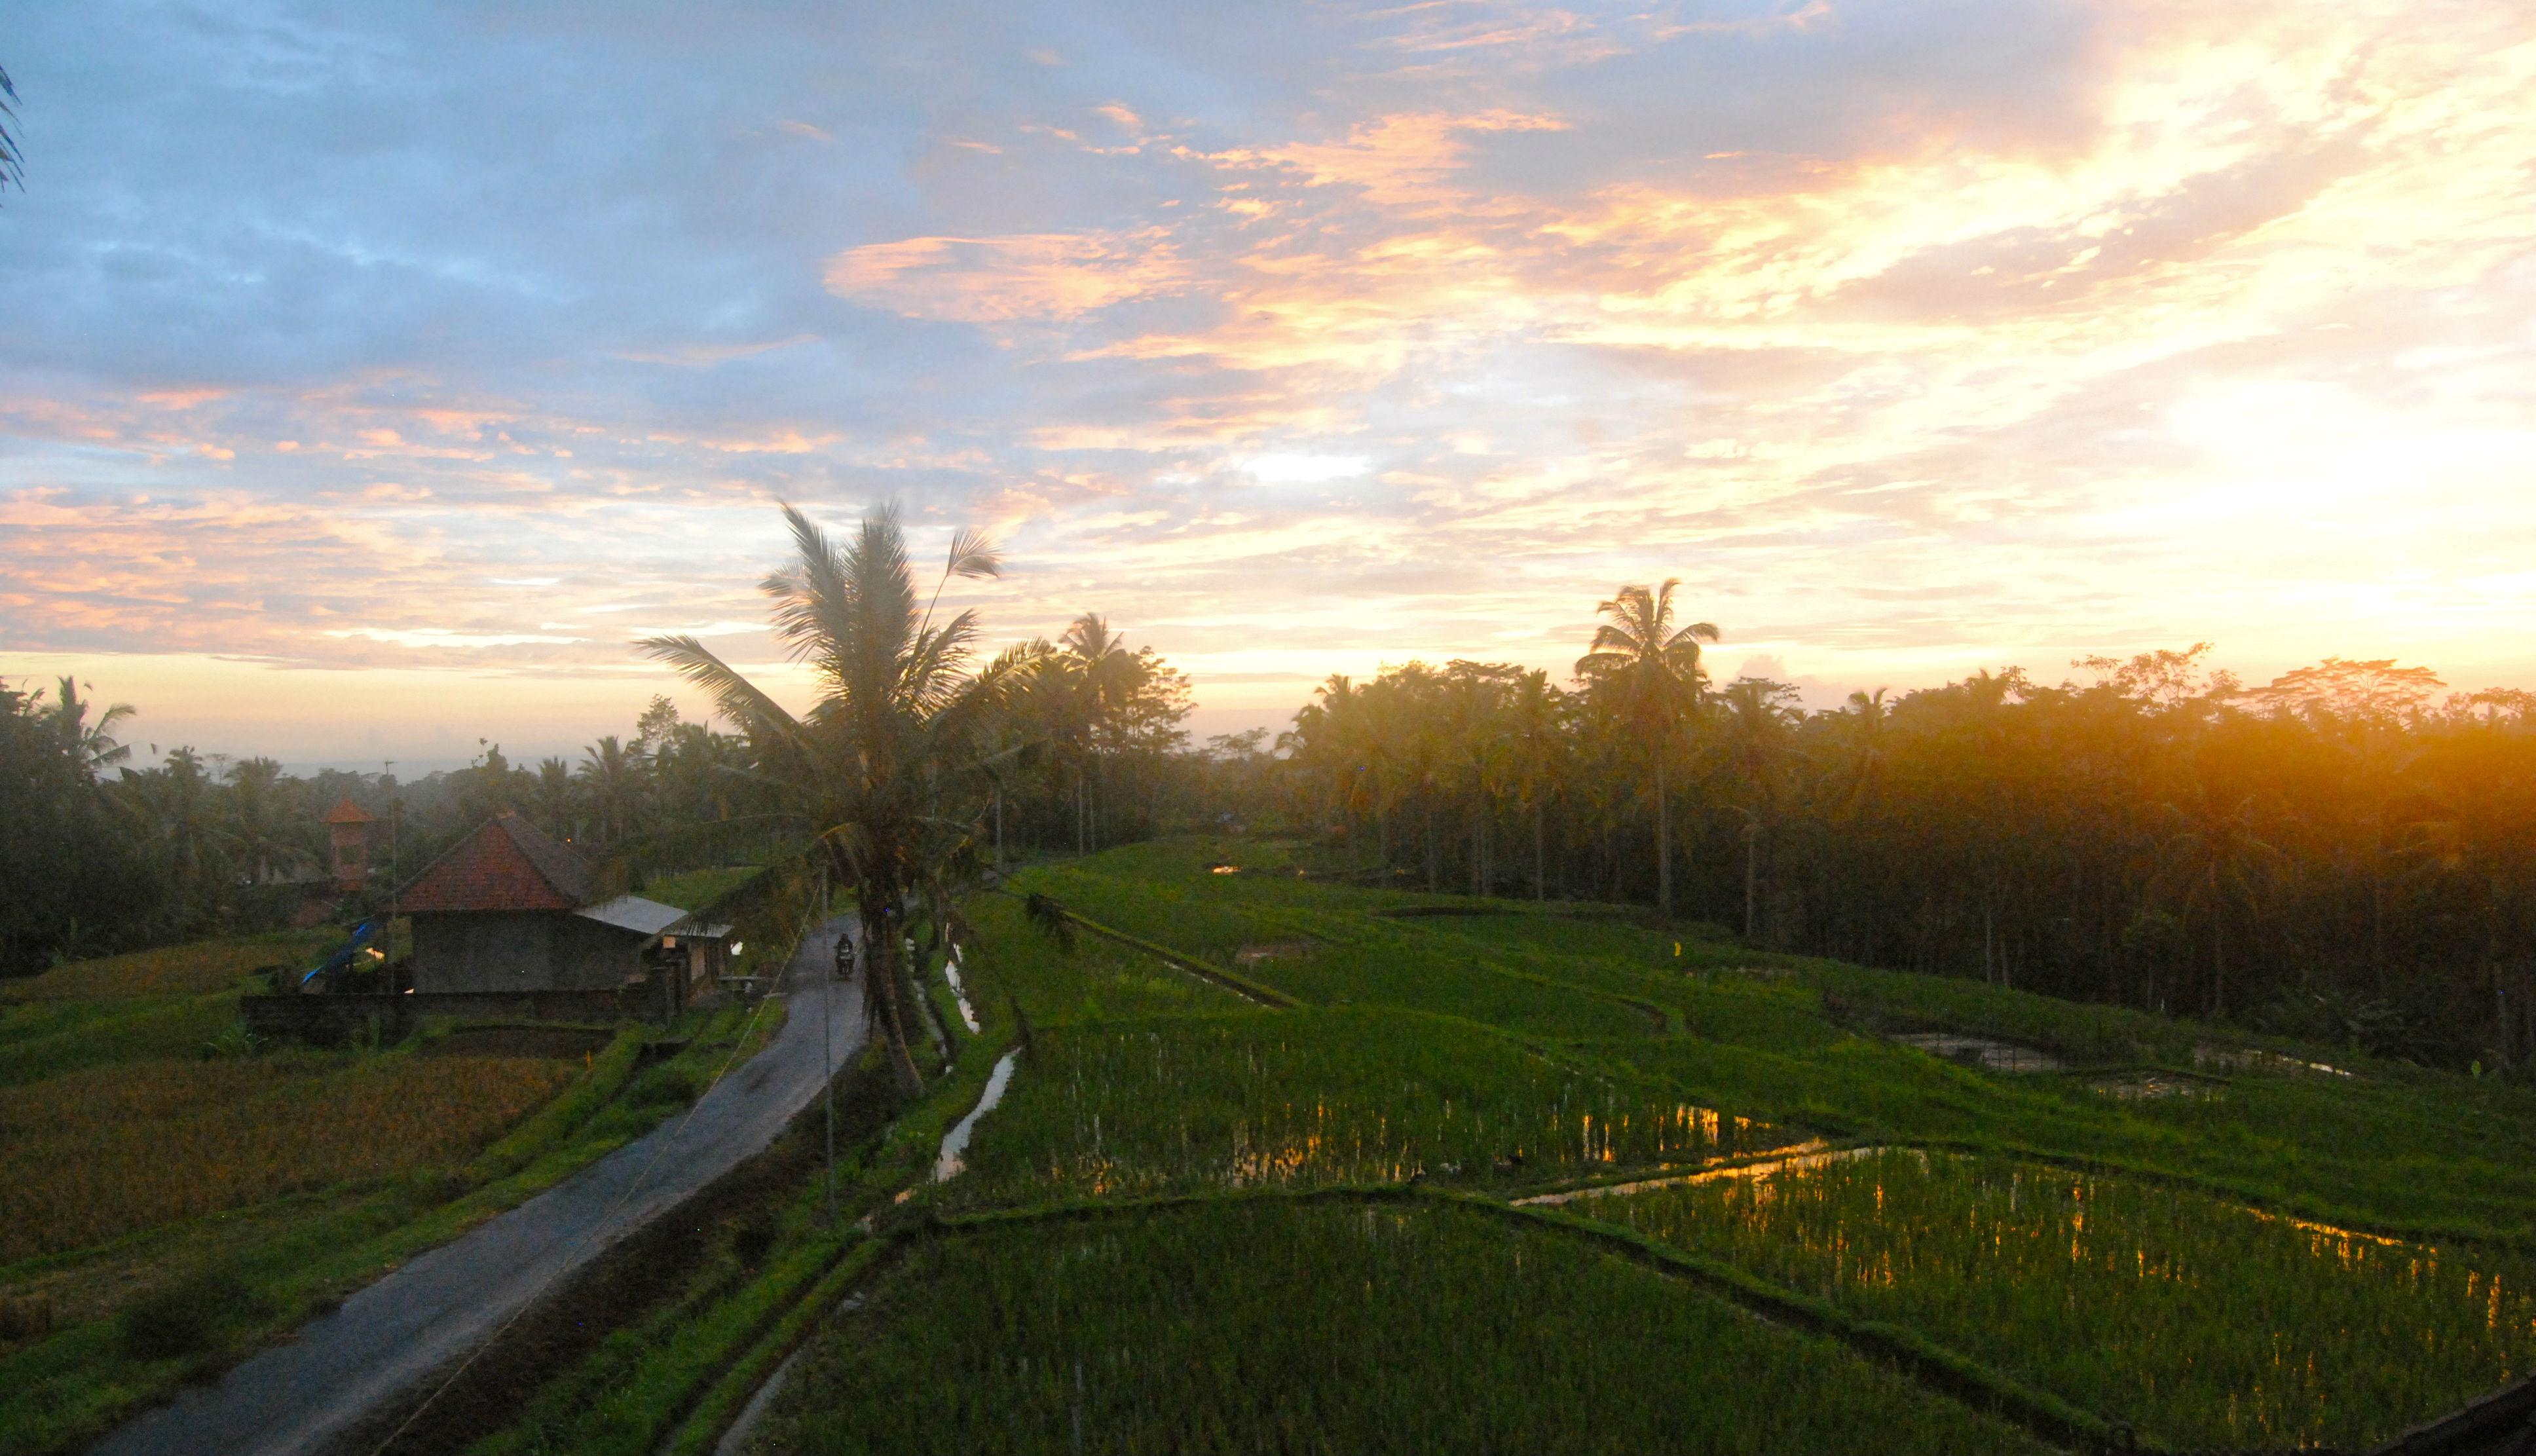 Ubud, Bali: More than just 'Eat, Pray, Love'